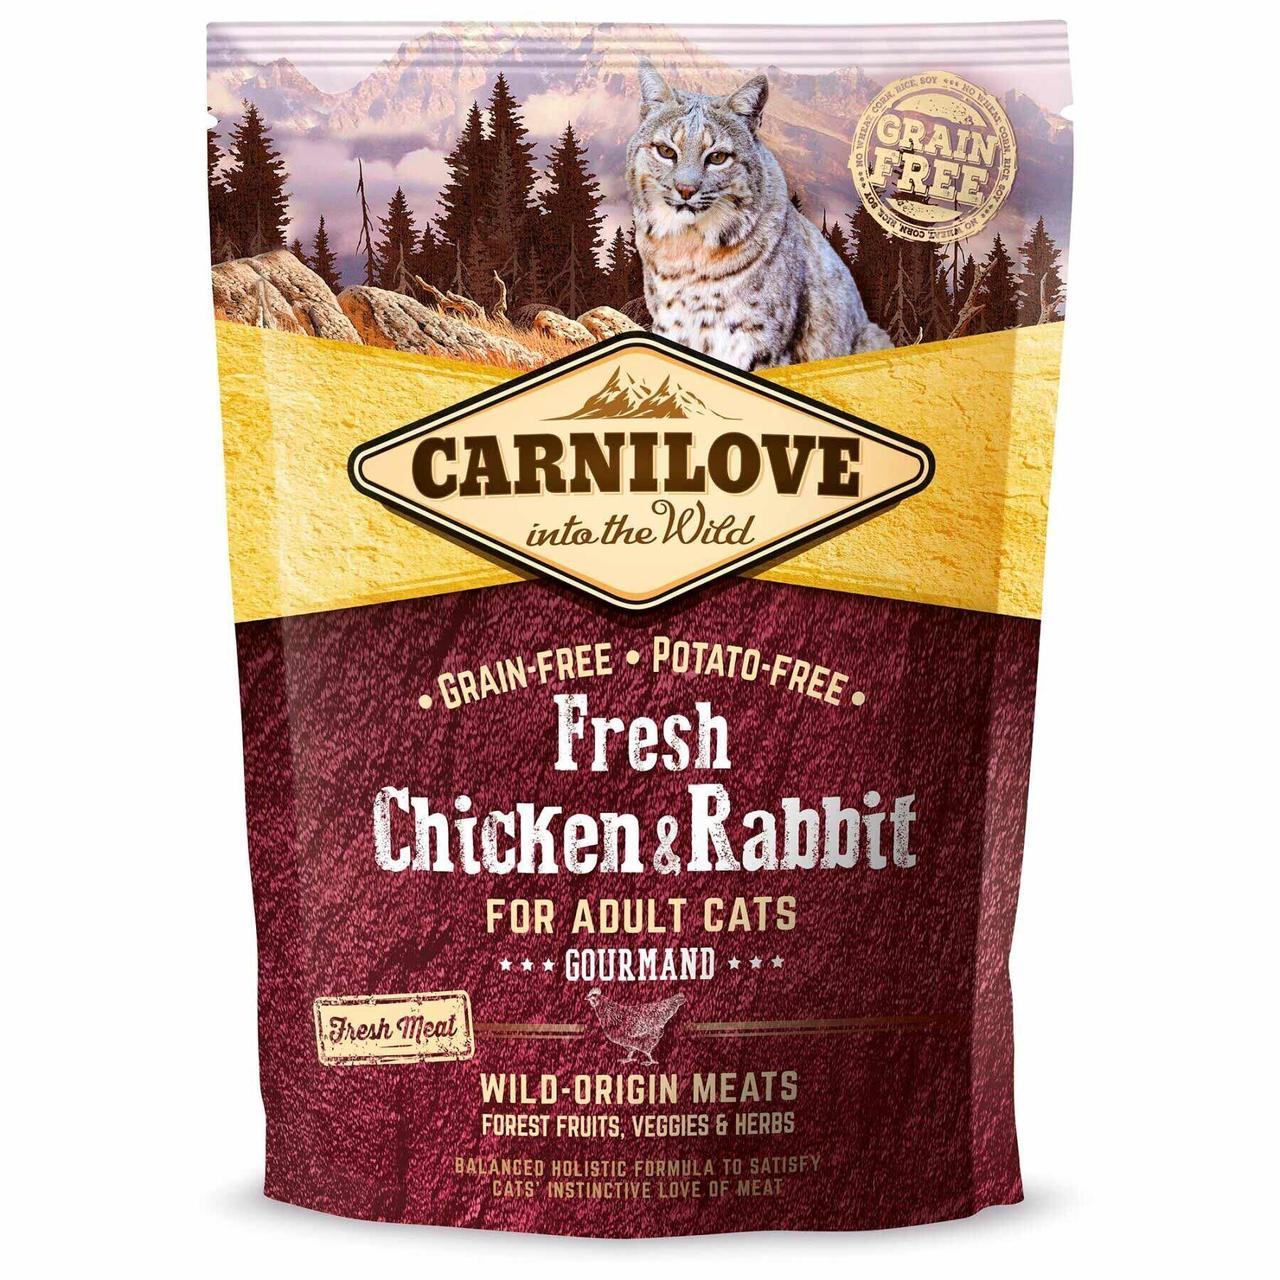 Сухой корм для взрослых кошек Carnilove Fresh Chicken & Rabbit 400 г (курица и кролик)